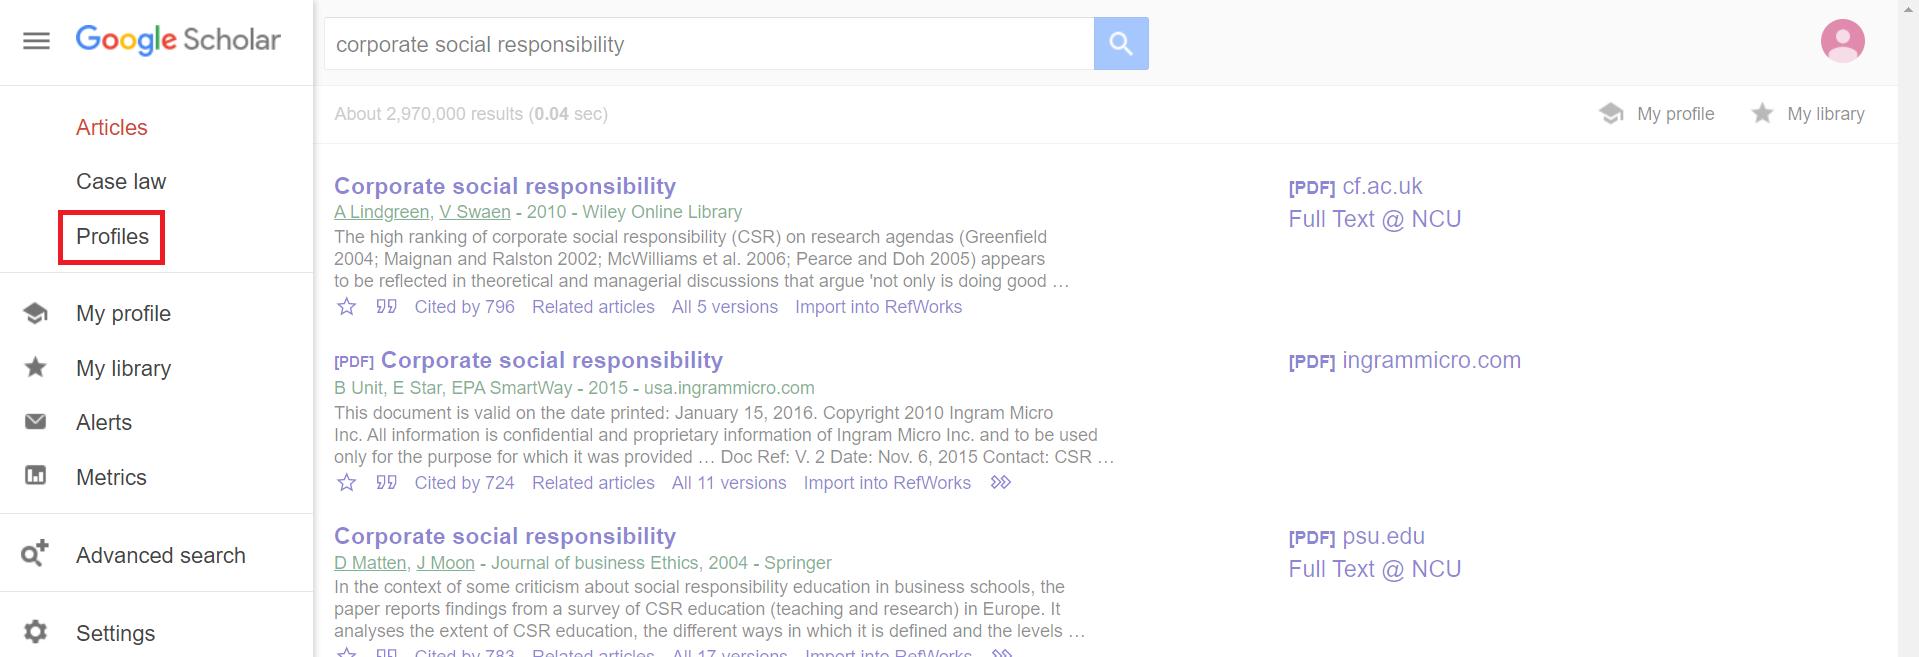 Profiles in Google Scholar